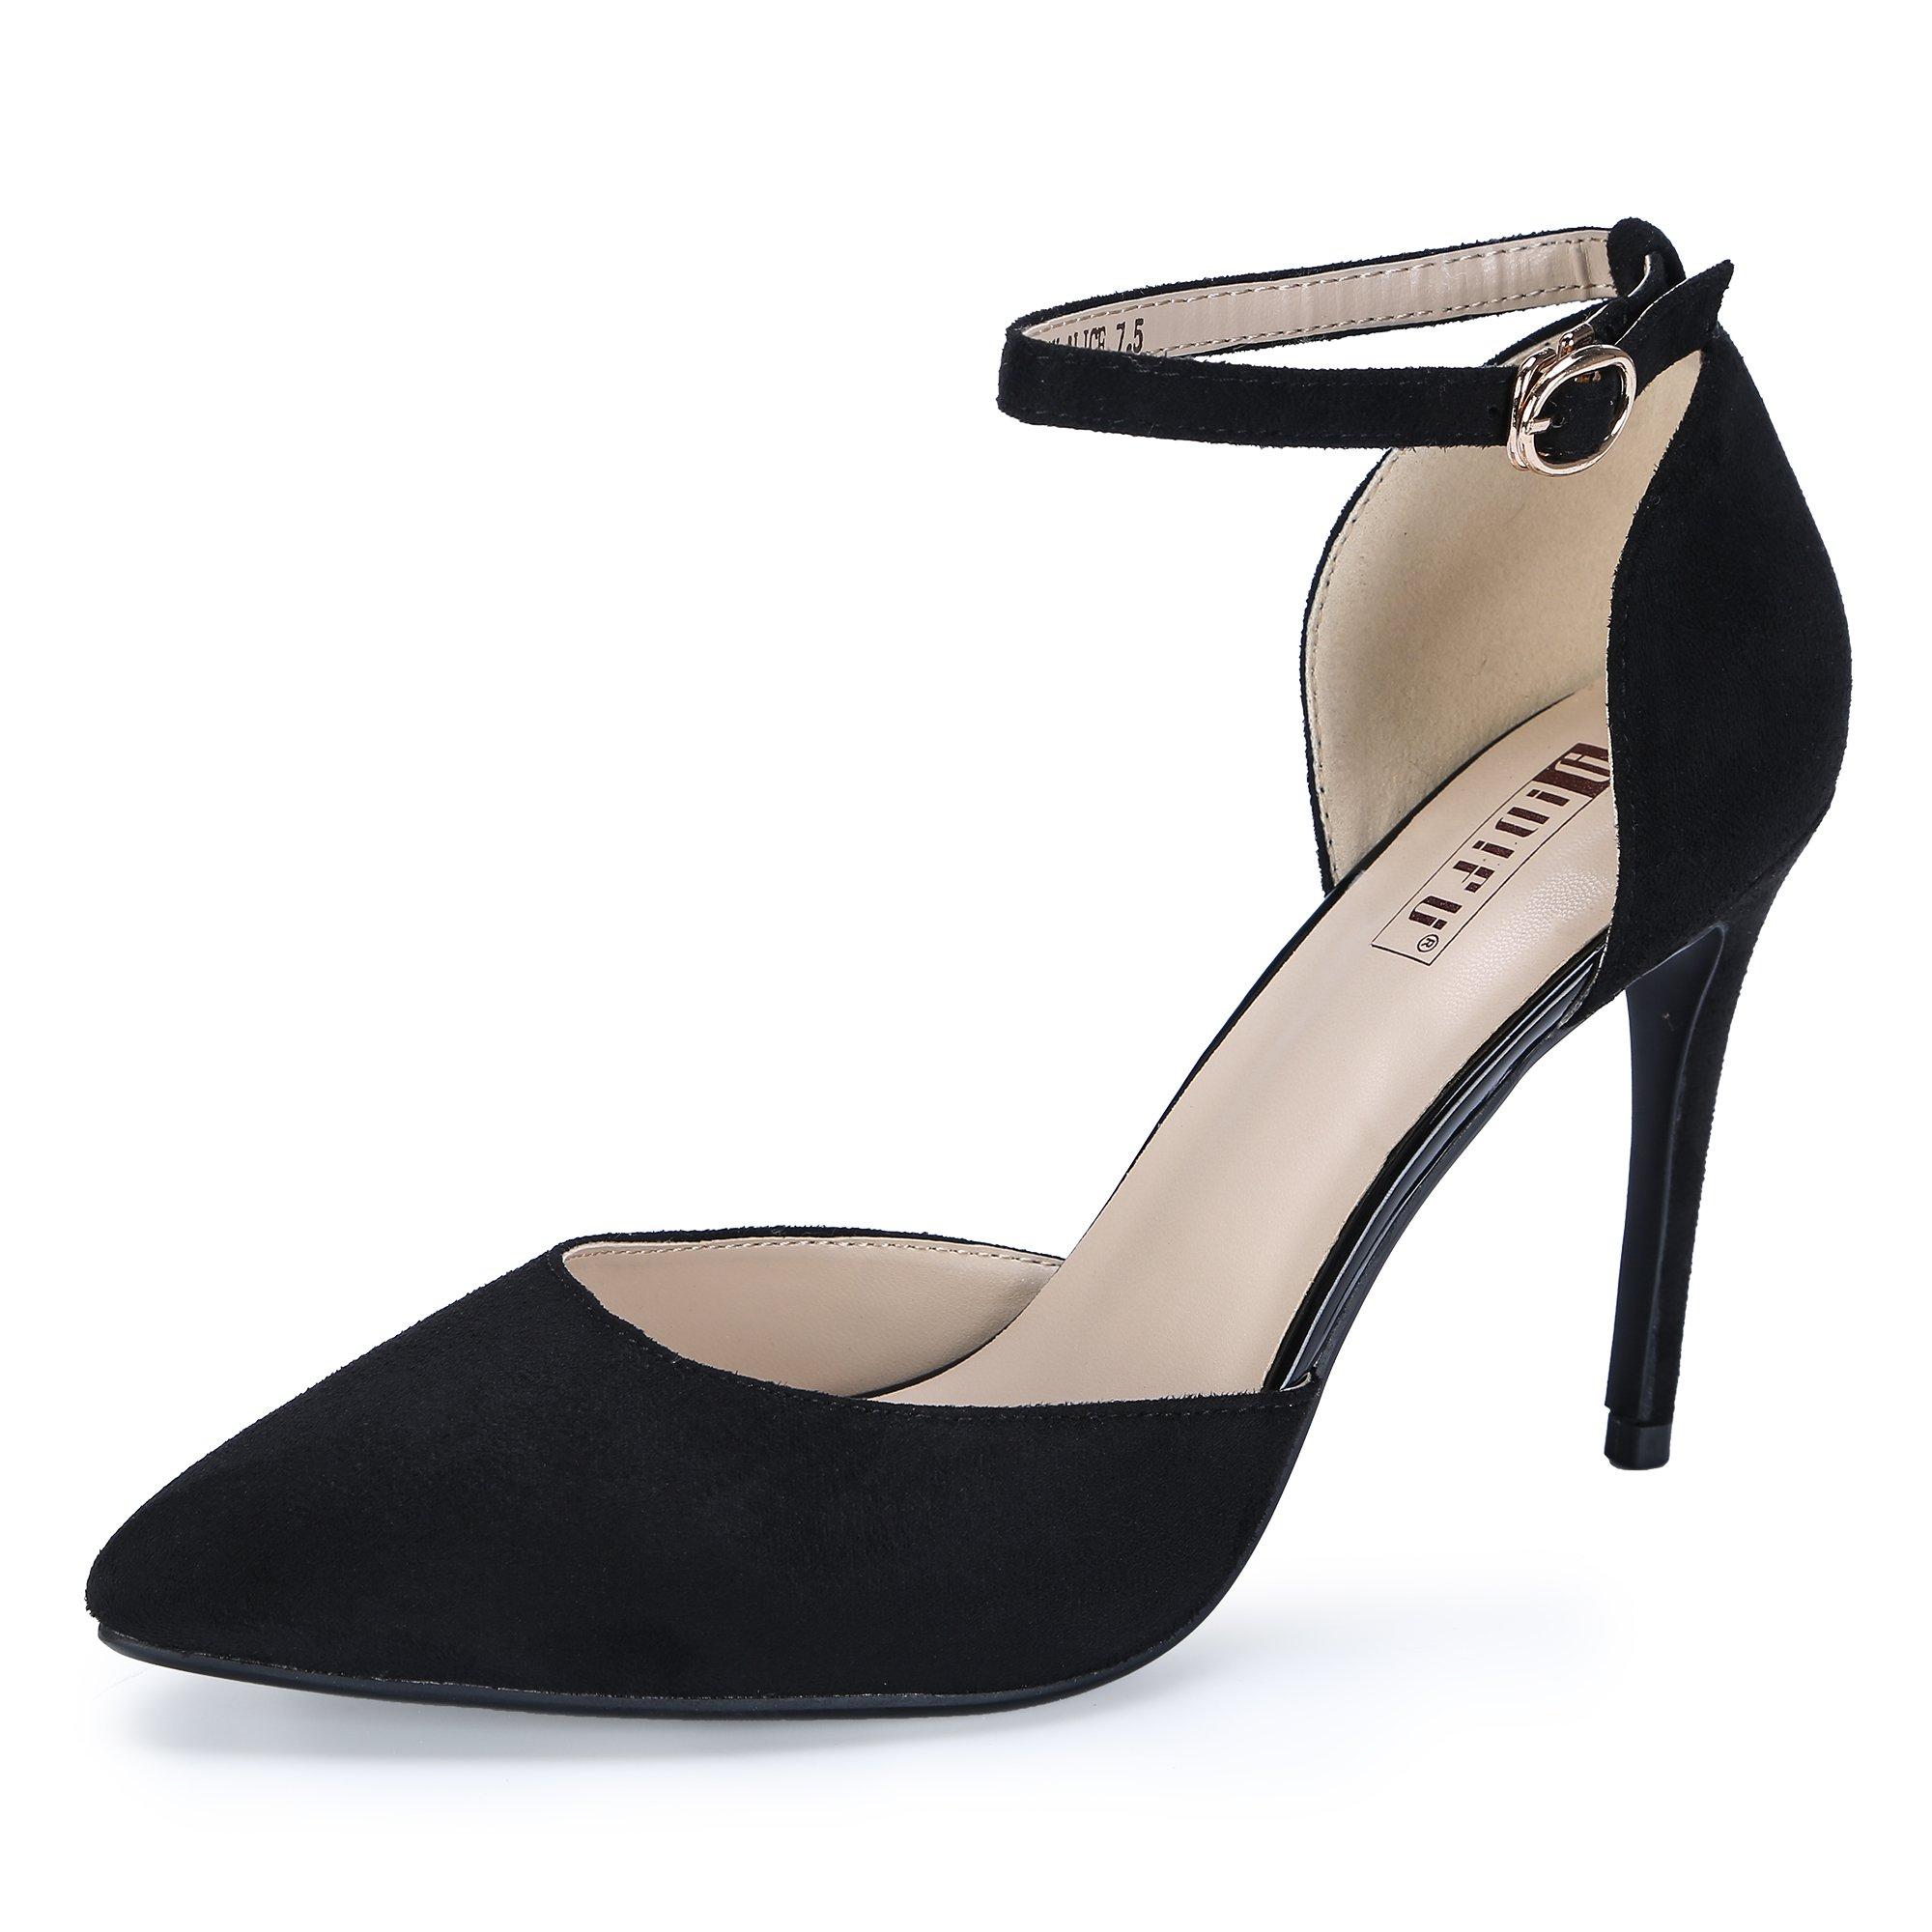 IDIFU Women's IN4 D'Orsay Alice Stiletto High Heel Ankle Strap Bridal Pump (Black Suede, 8 B(M) US)